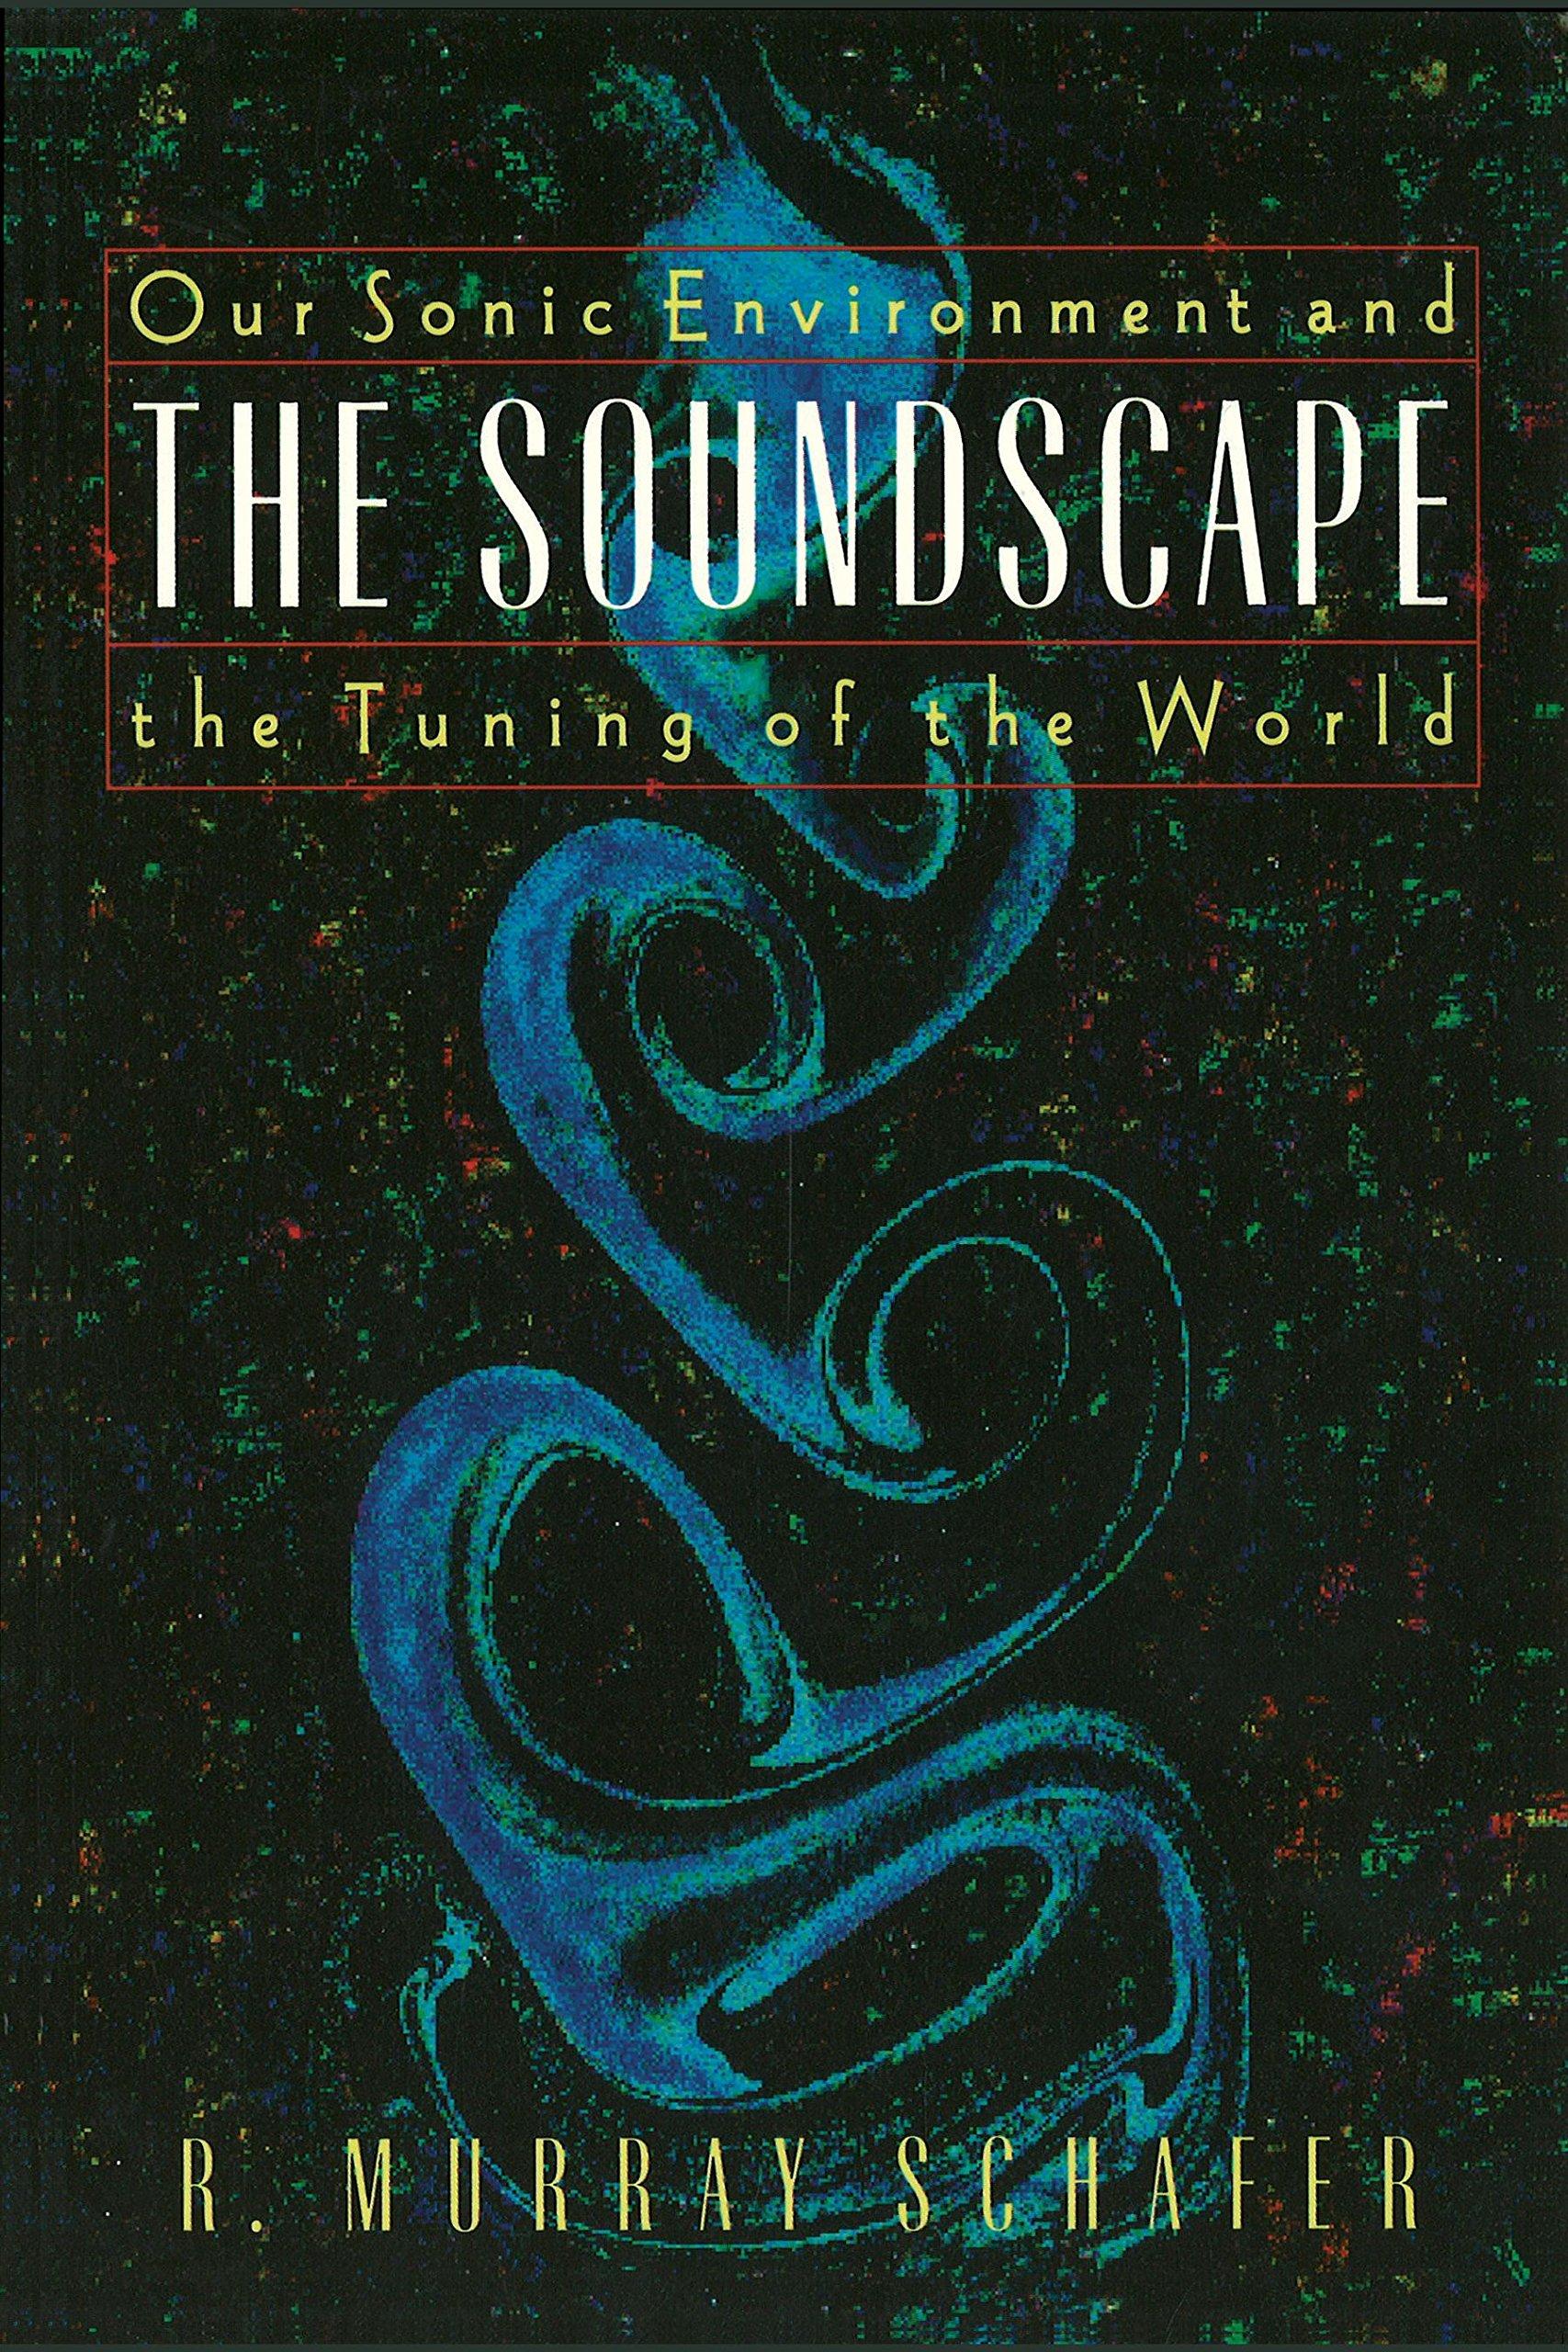 The Soundscape Paperback – October 1, 1993 R. Murray Schafer Destiny Books 0892814551 Acoustics & Sound